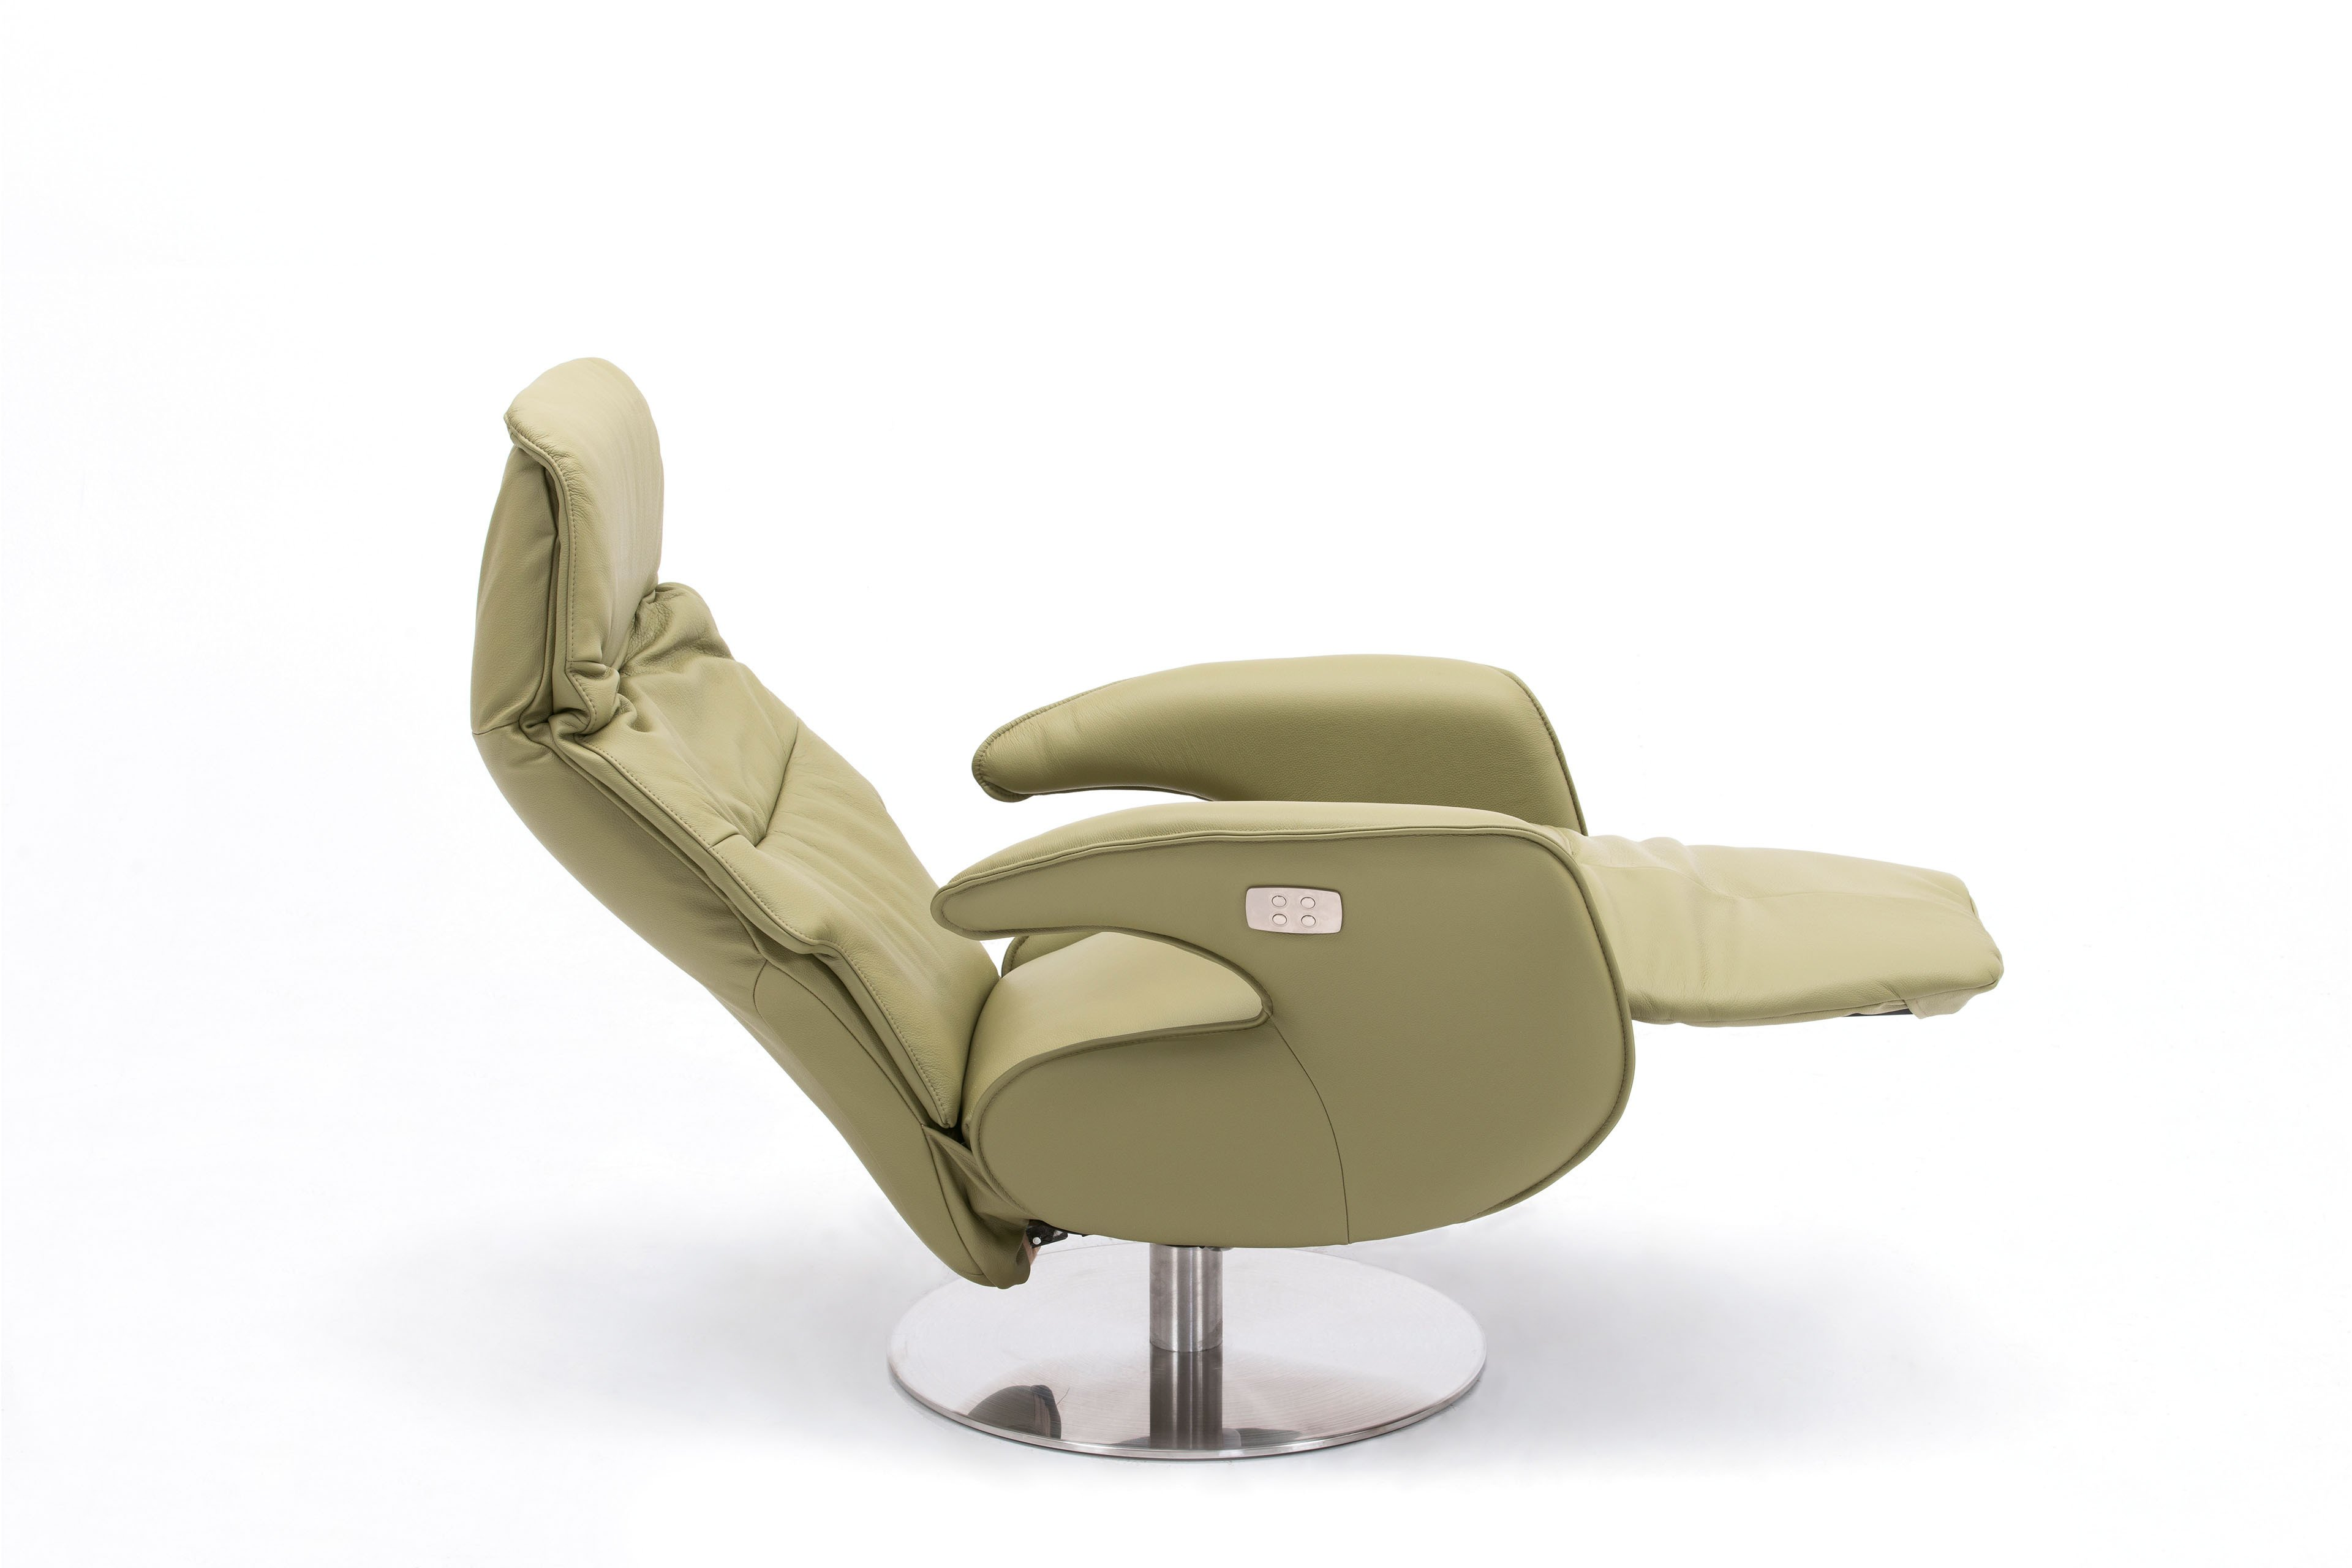 skandinavische m bel aaltje tv sessel in limetten gr n. Black Bedroom Furniture Sets. Home Design Ideas